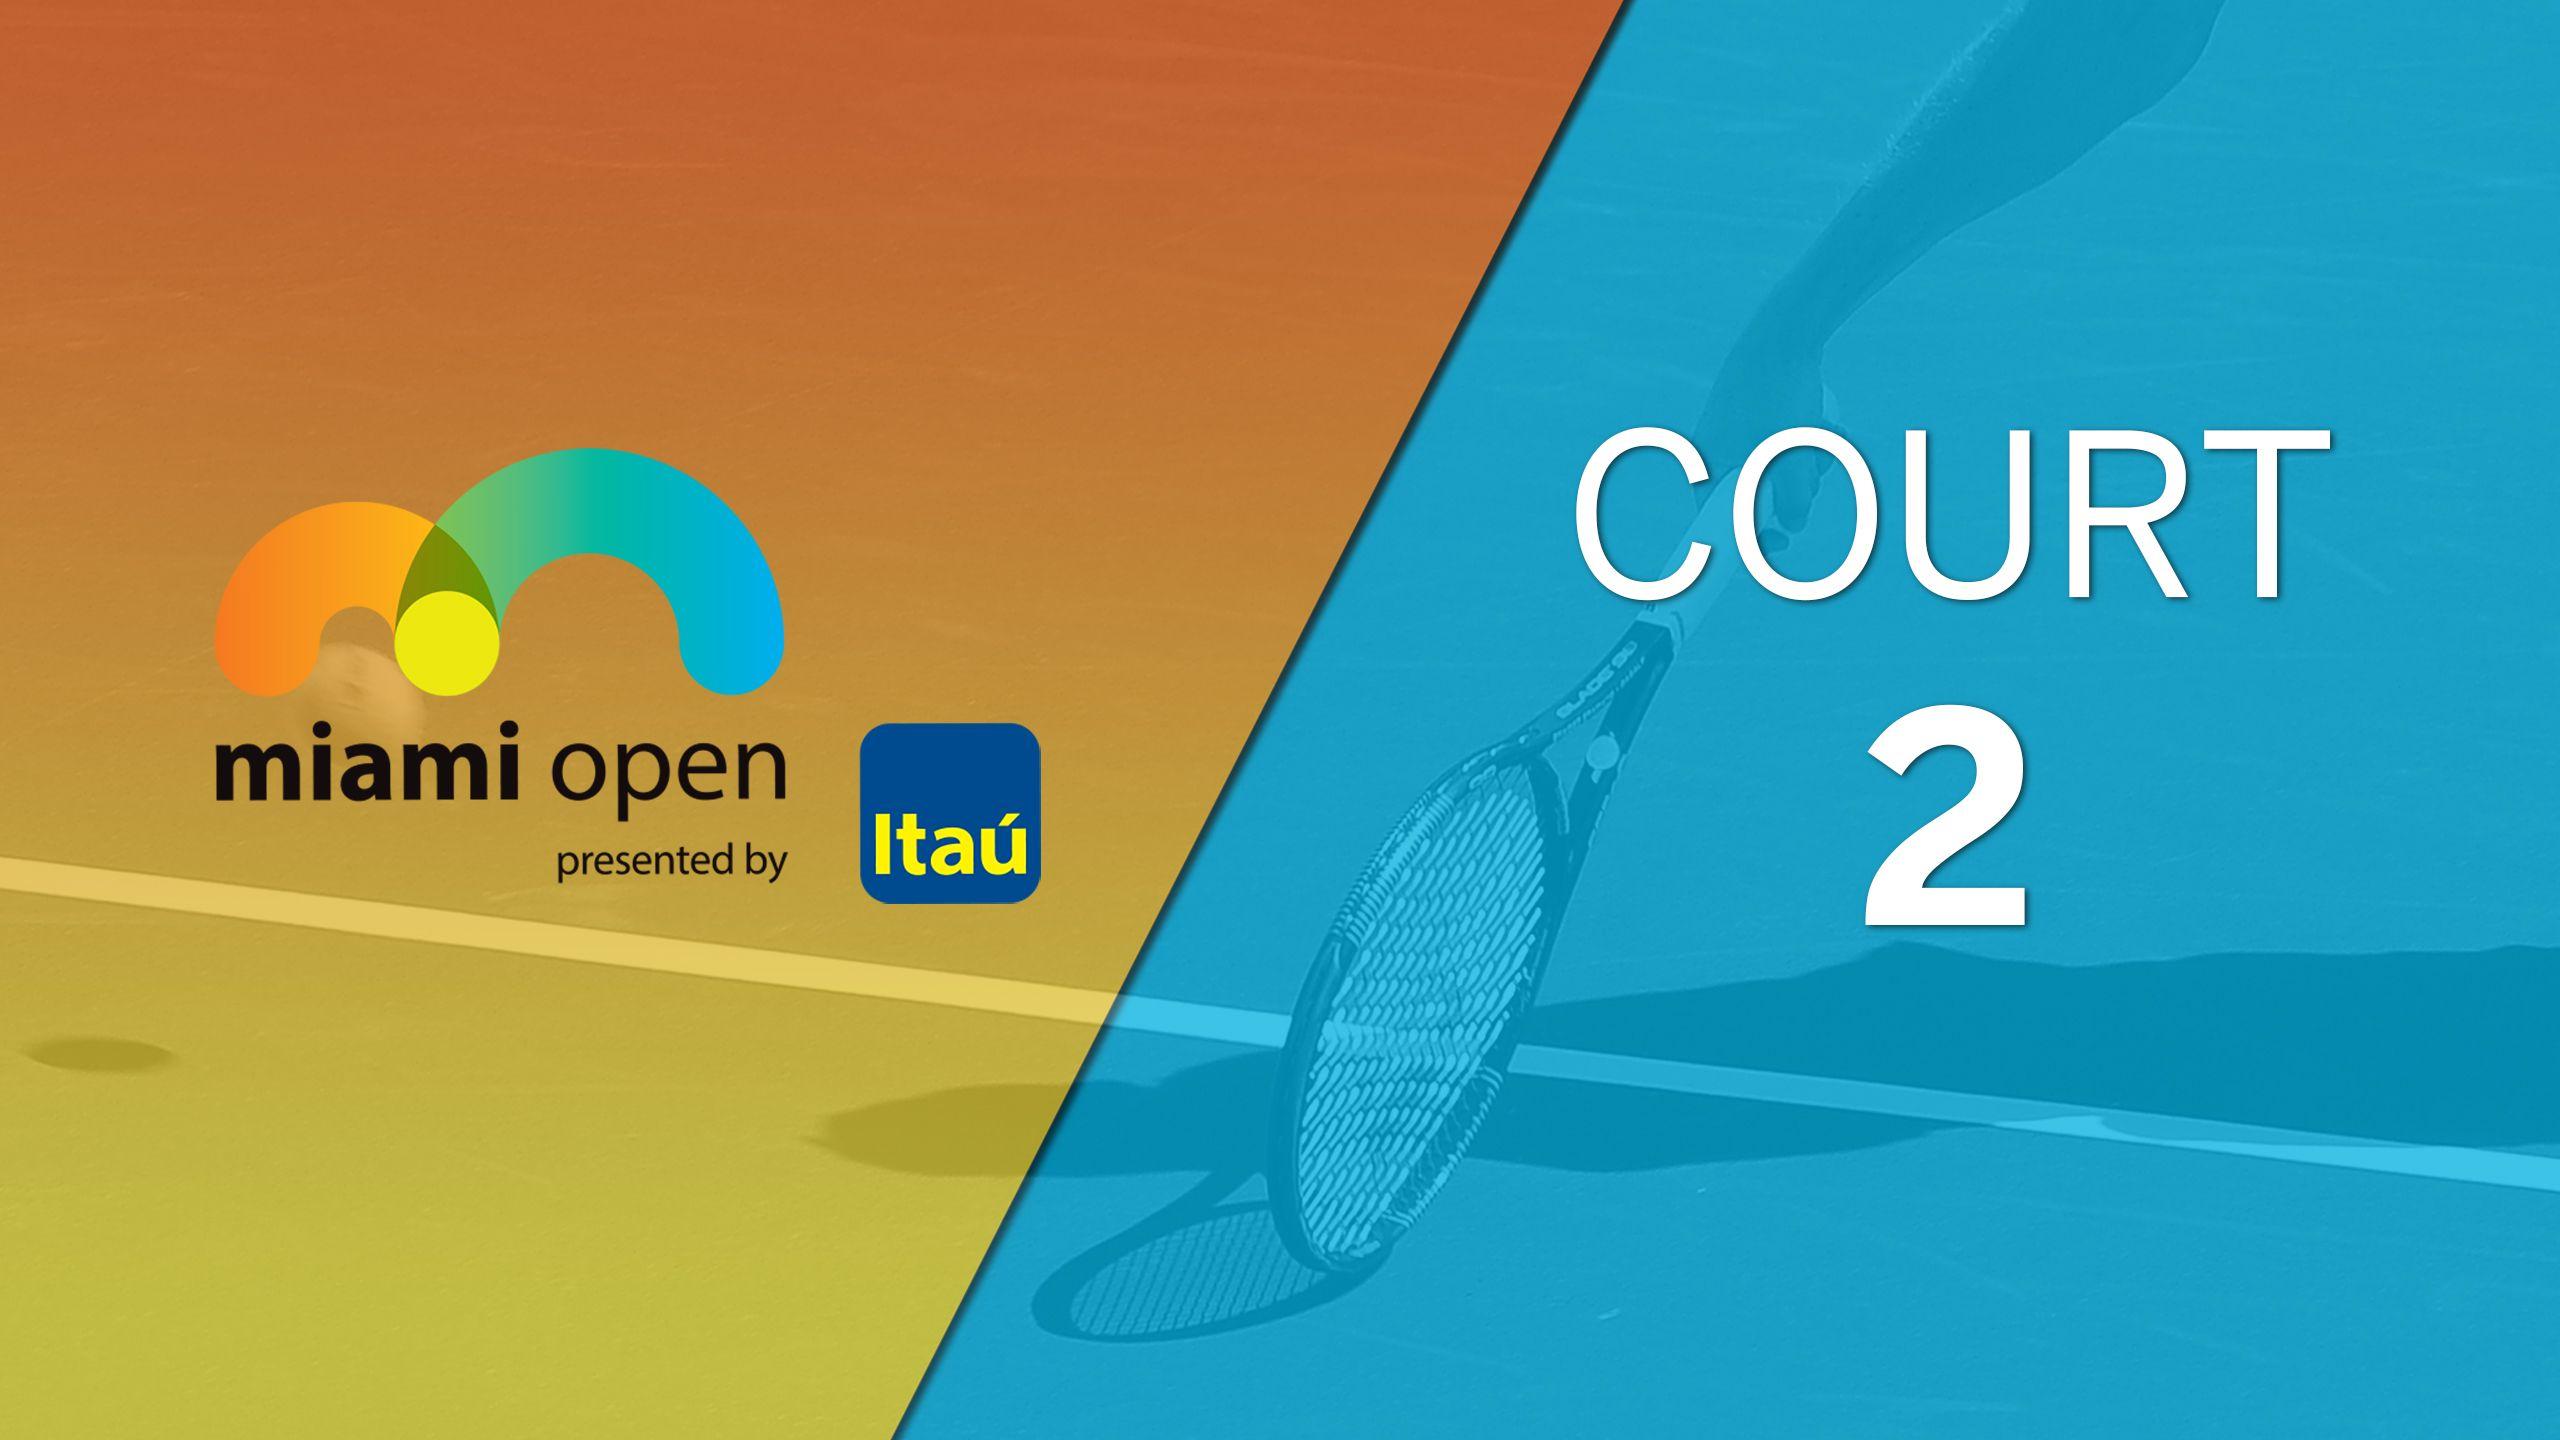 Miami Open - Court 2 (Second Round)